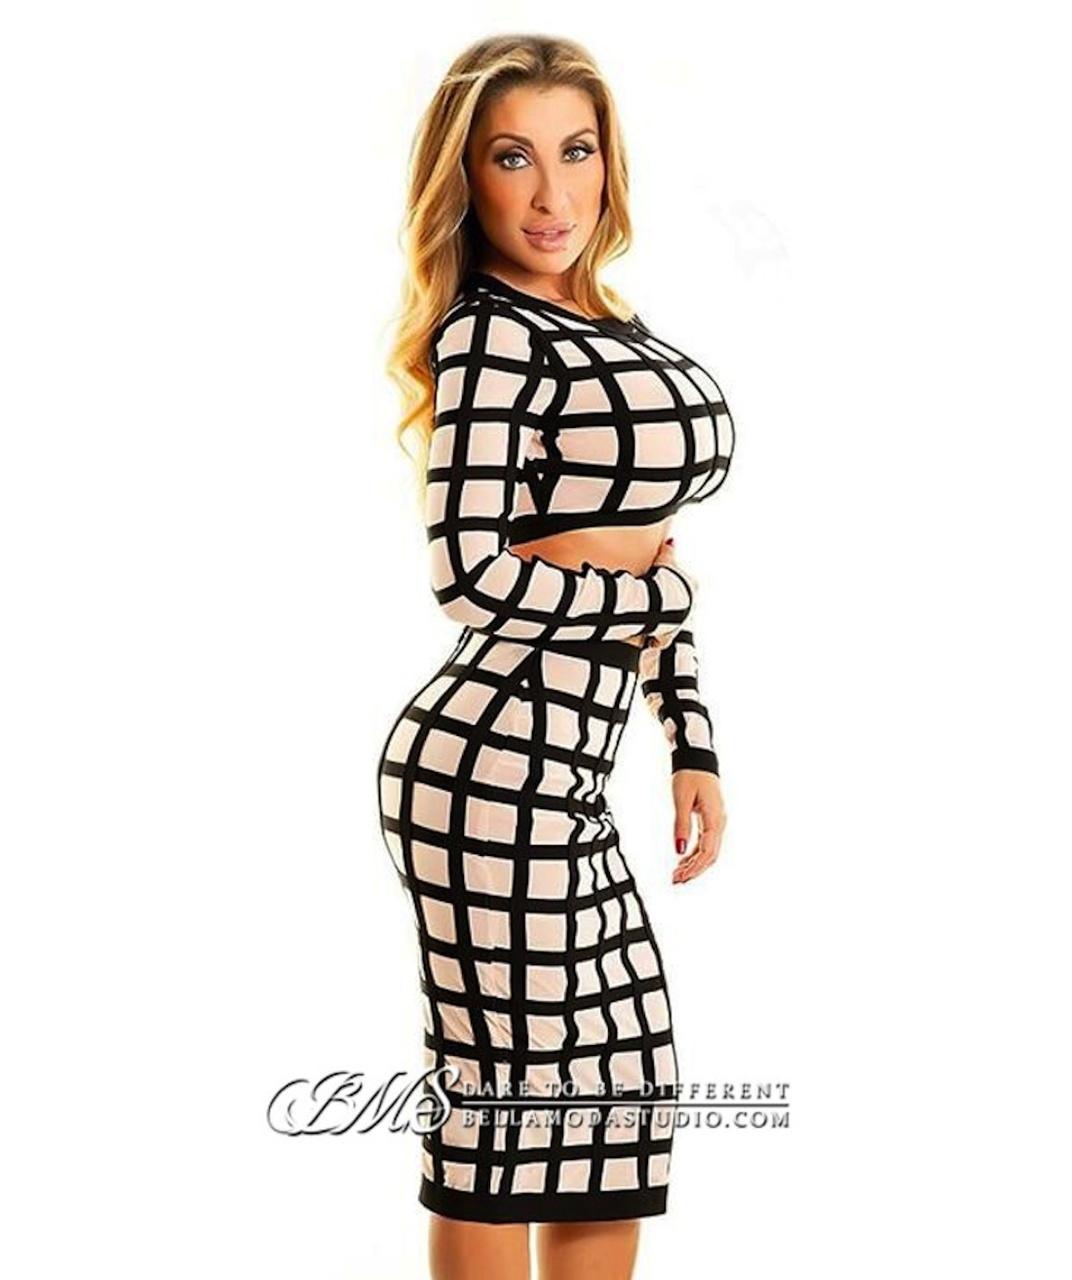 Nude & Black Checkered Sheer Mesh Two Piece Bandage Dress